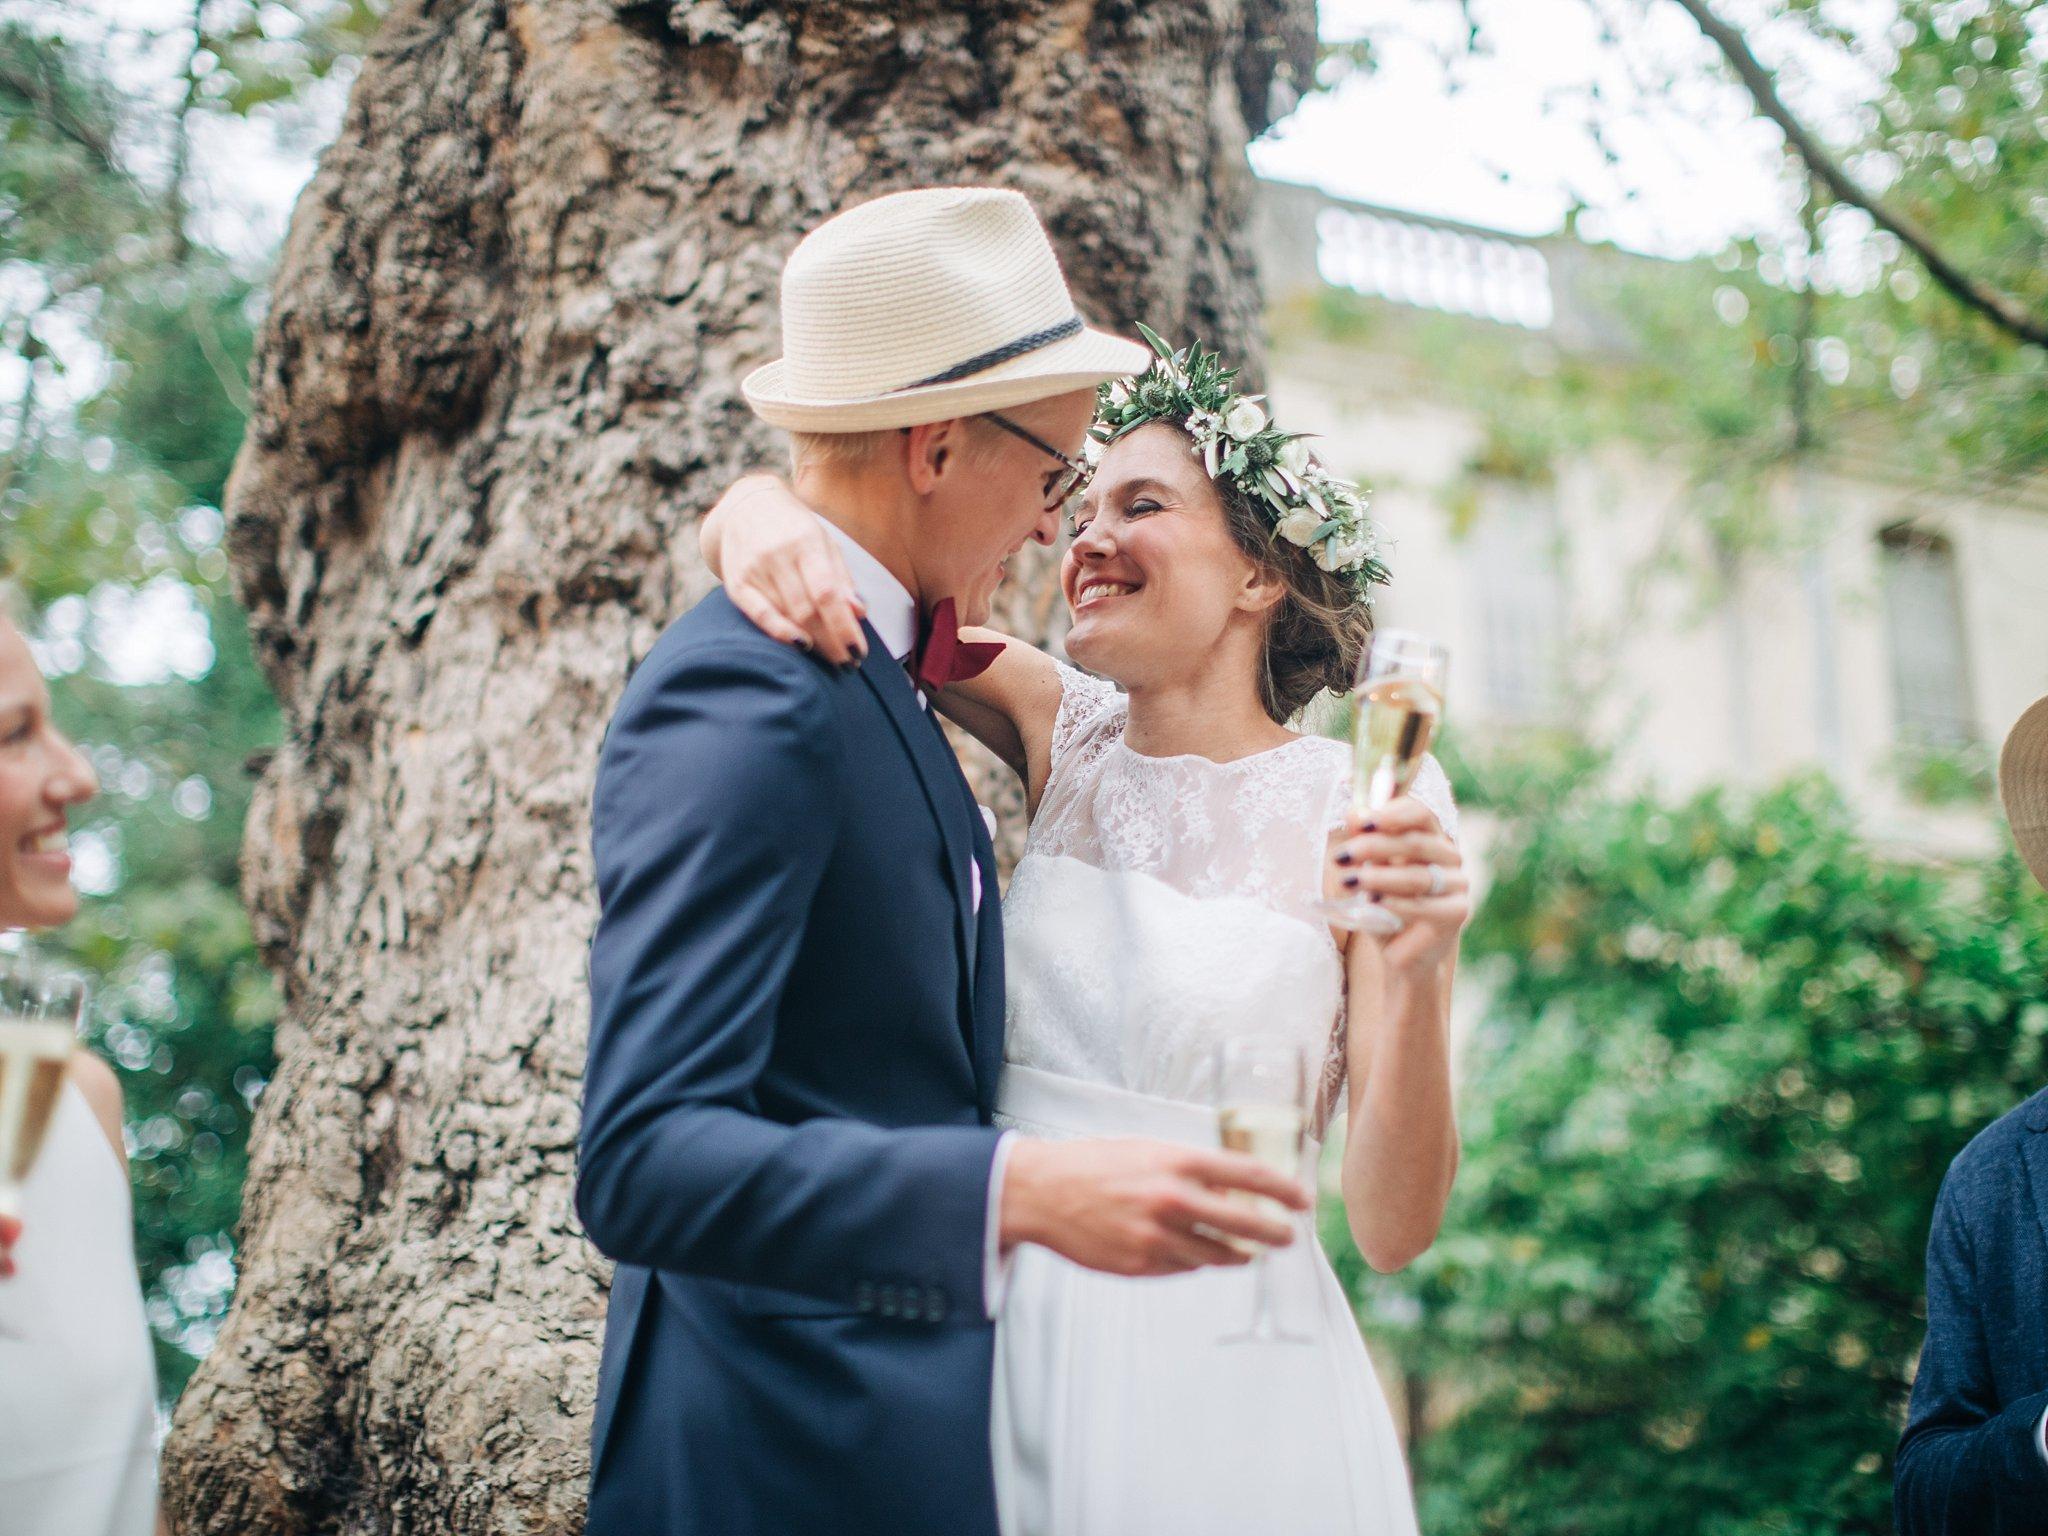 Wedding Photographer Perpignan - Château Las Collas Wedding - Hugo Hennequin032.jpg